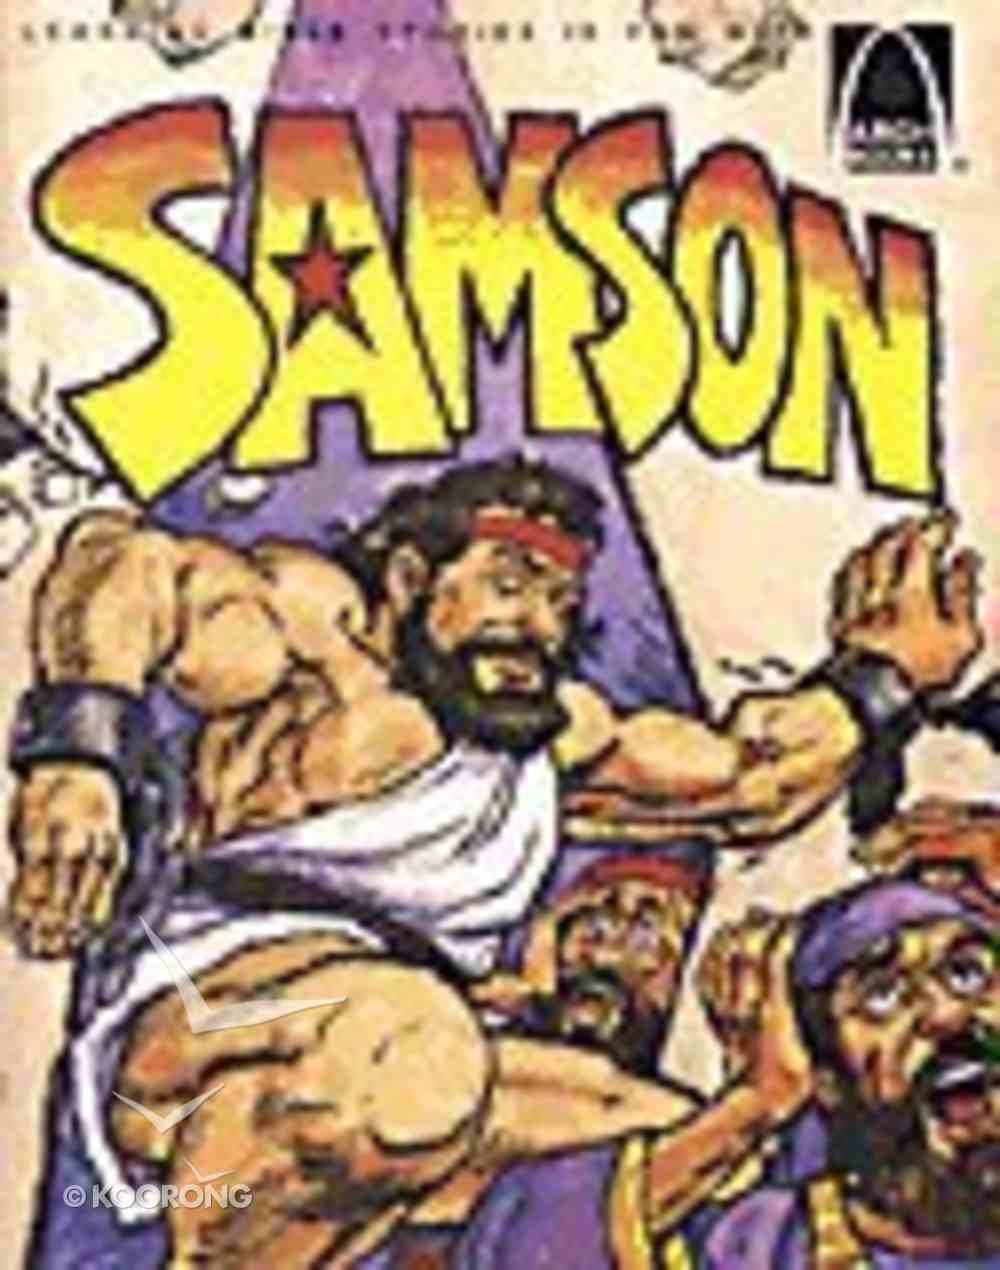 Samson (Arch Books Series) Paperback